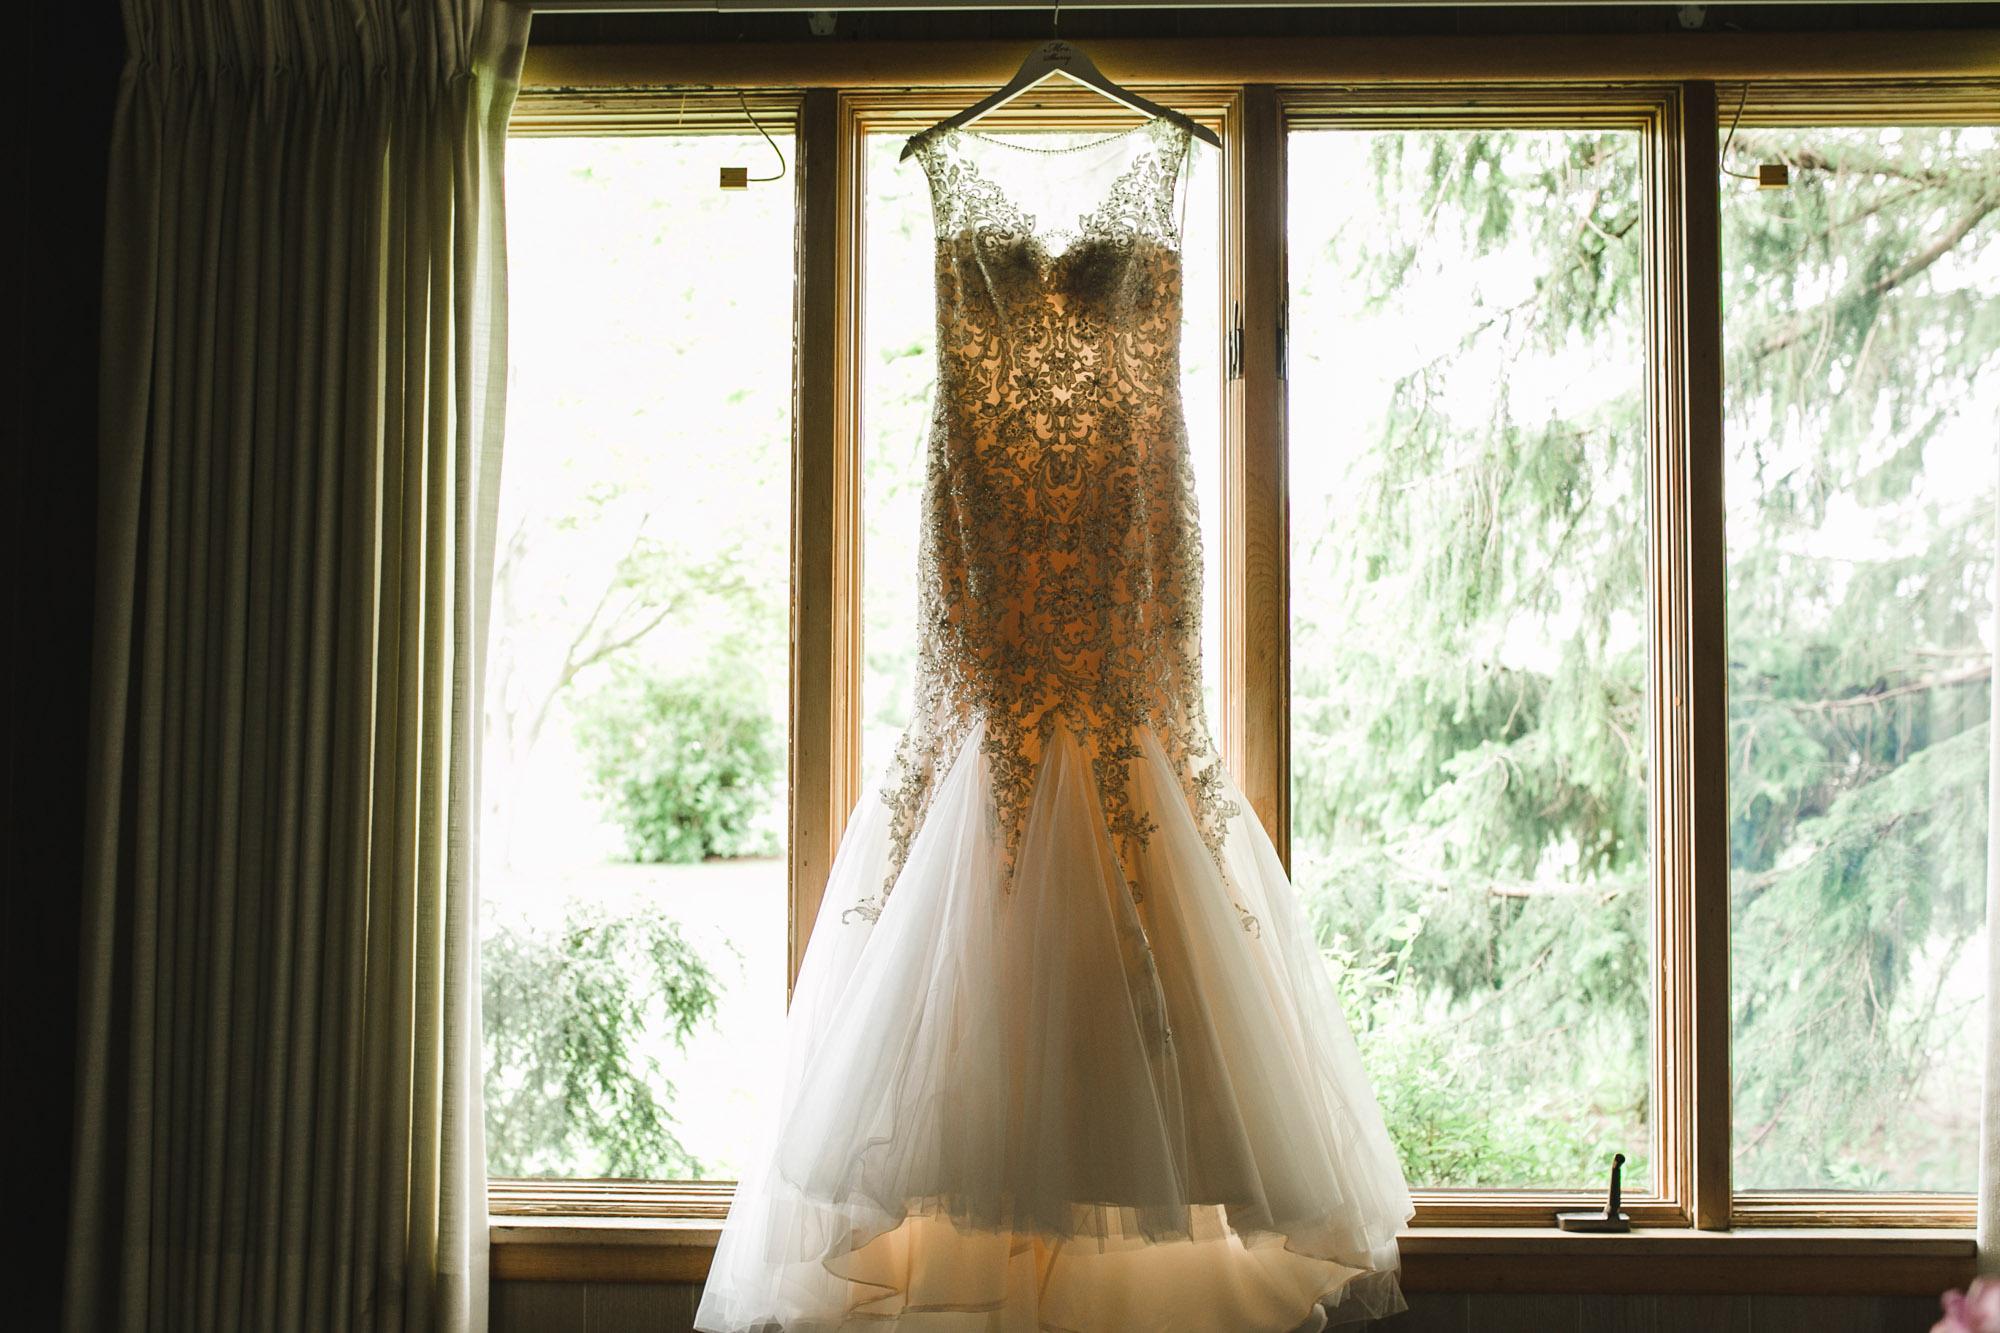 hensville-wedding-downtown-toledo-ohio (4 of 103).jpg